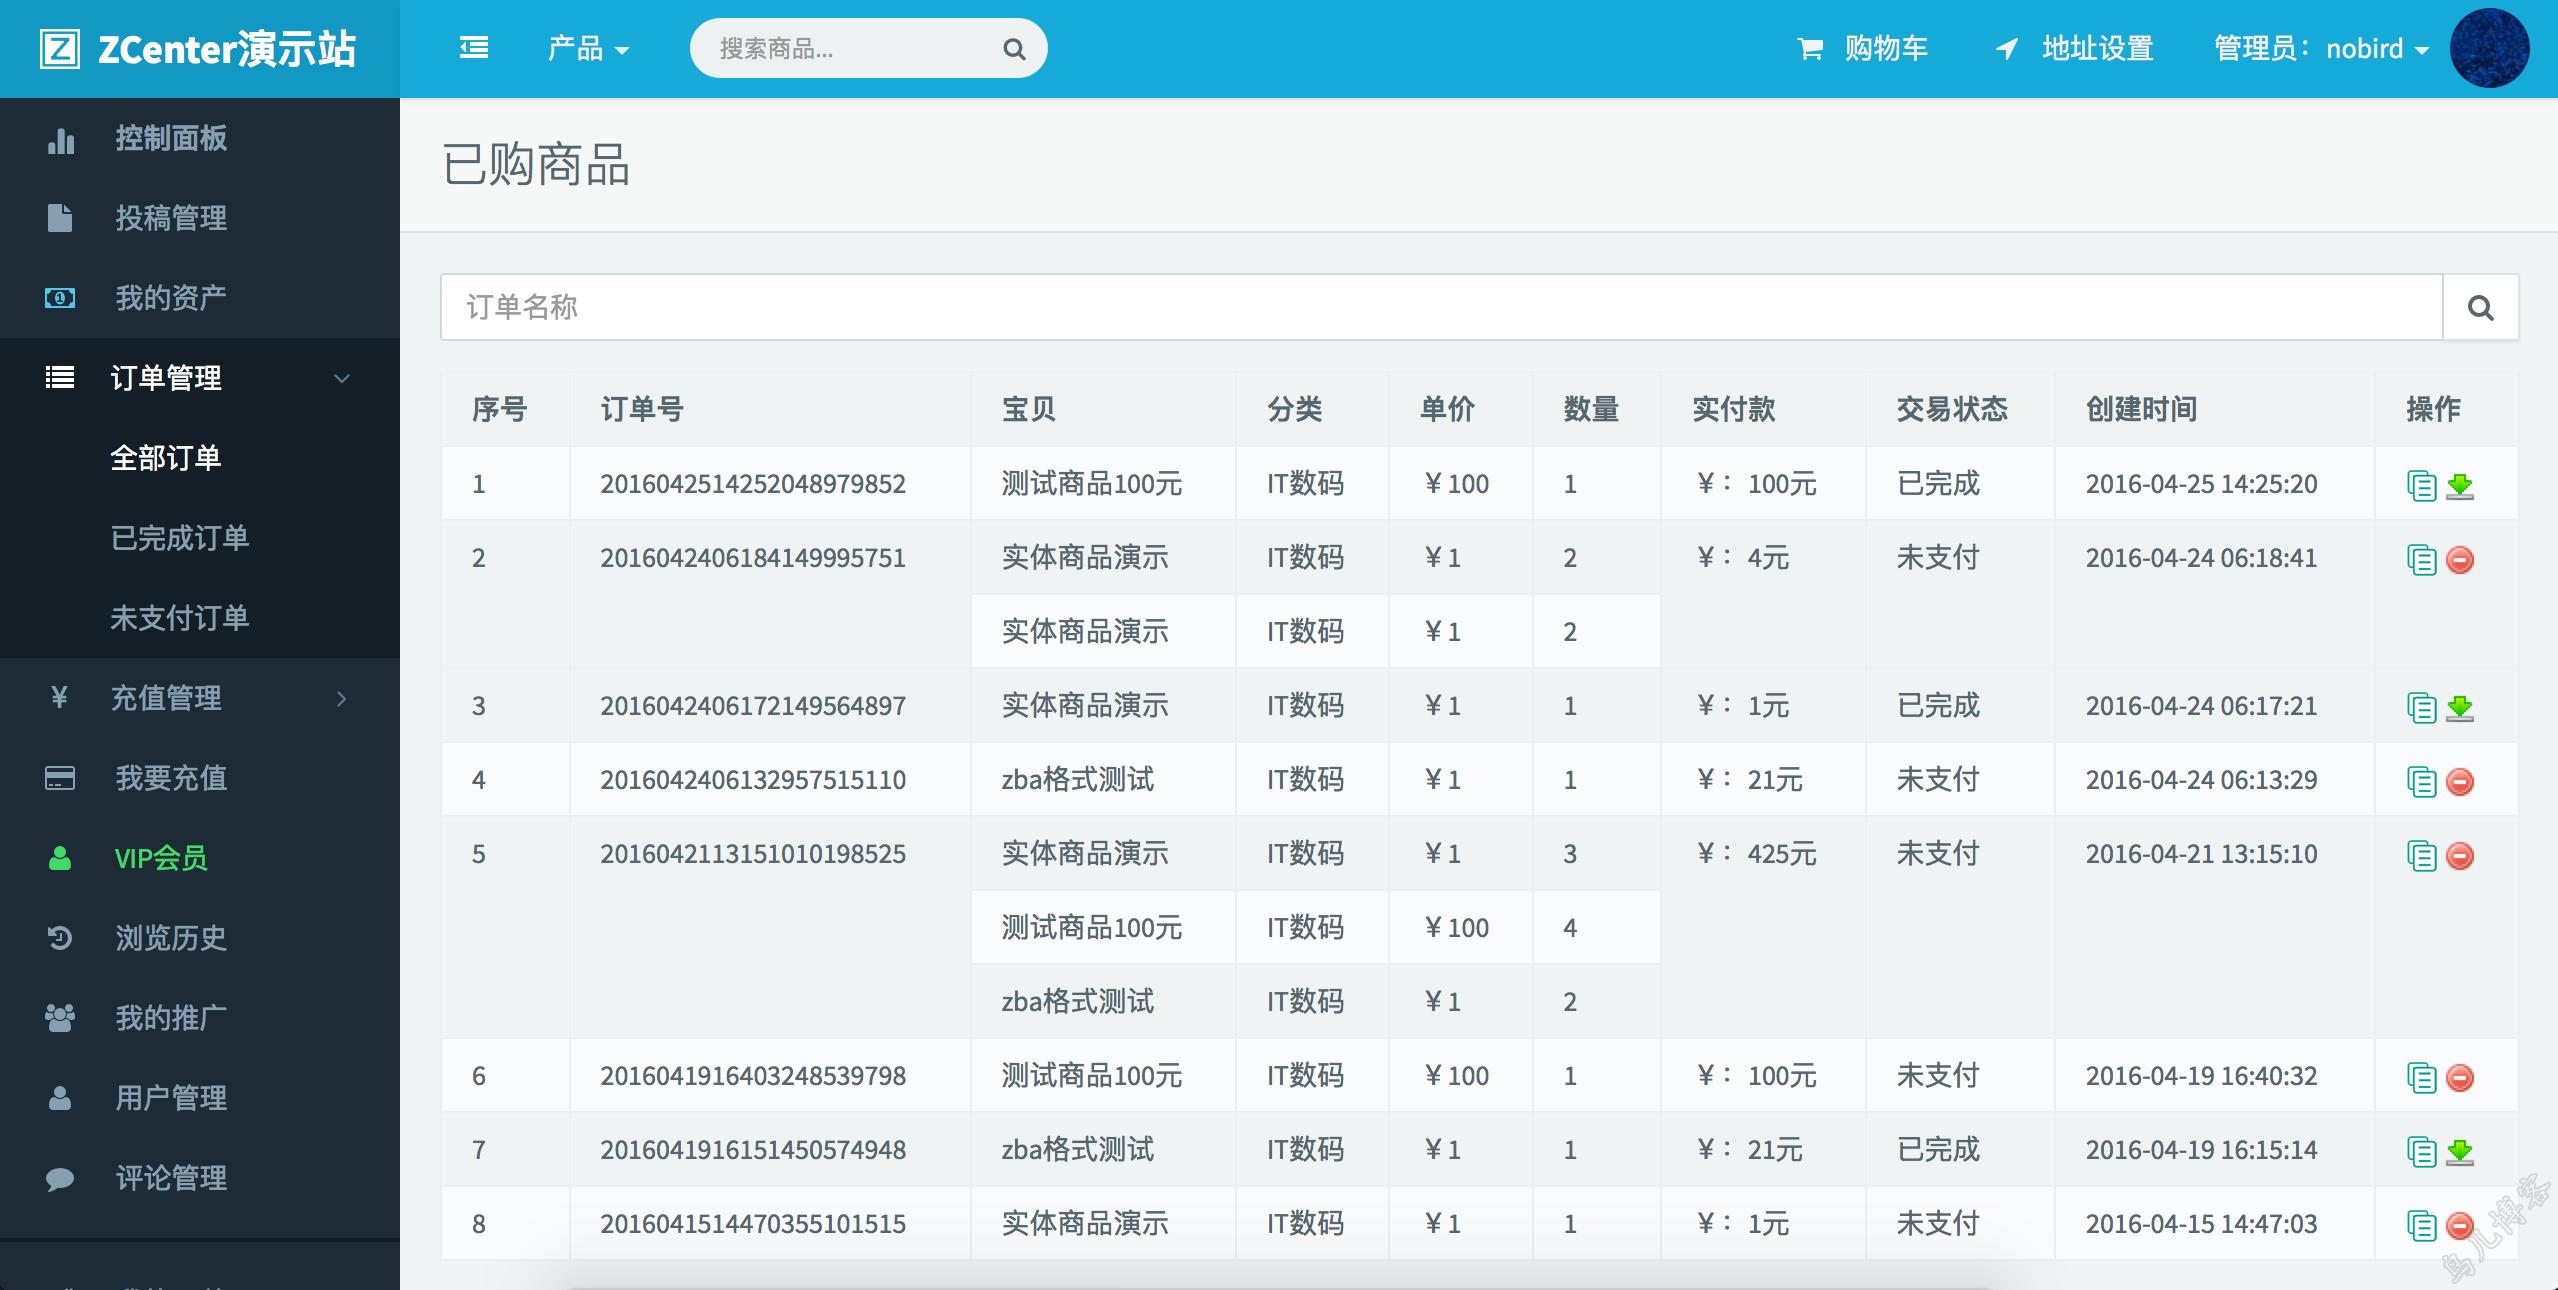 ZBLOG商城用户中心插件(支付宝、微信、财付通、PayPal、云支付)   第1页 ZCenter 精品应用 用户中心 ZBLOG ZBLOGPHP插件  第2张